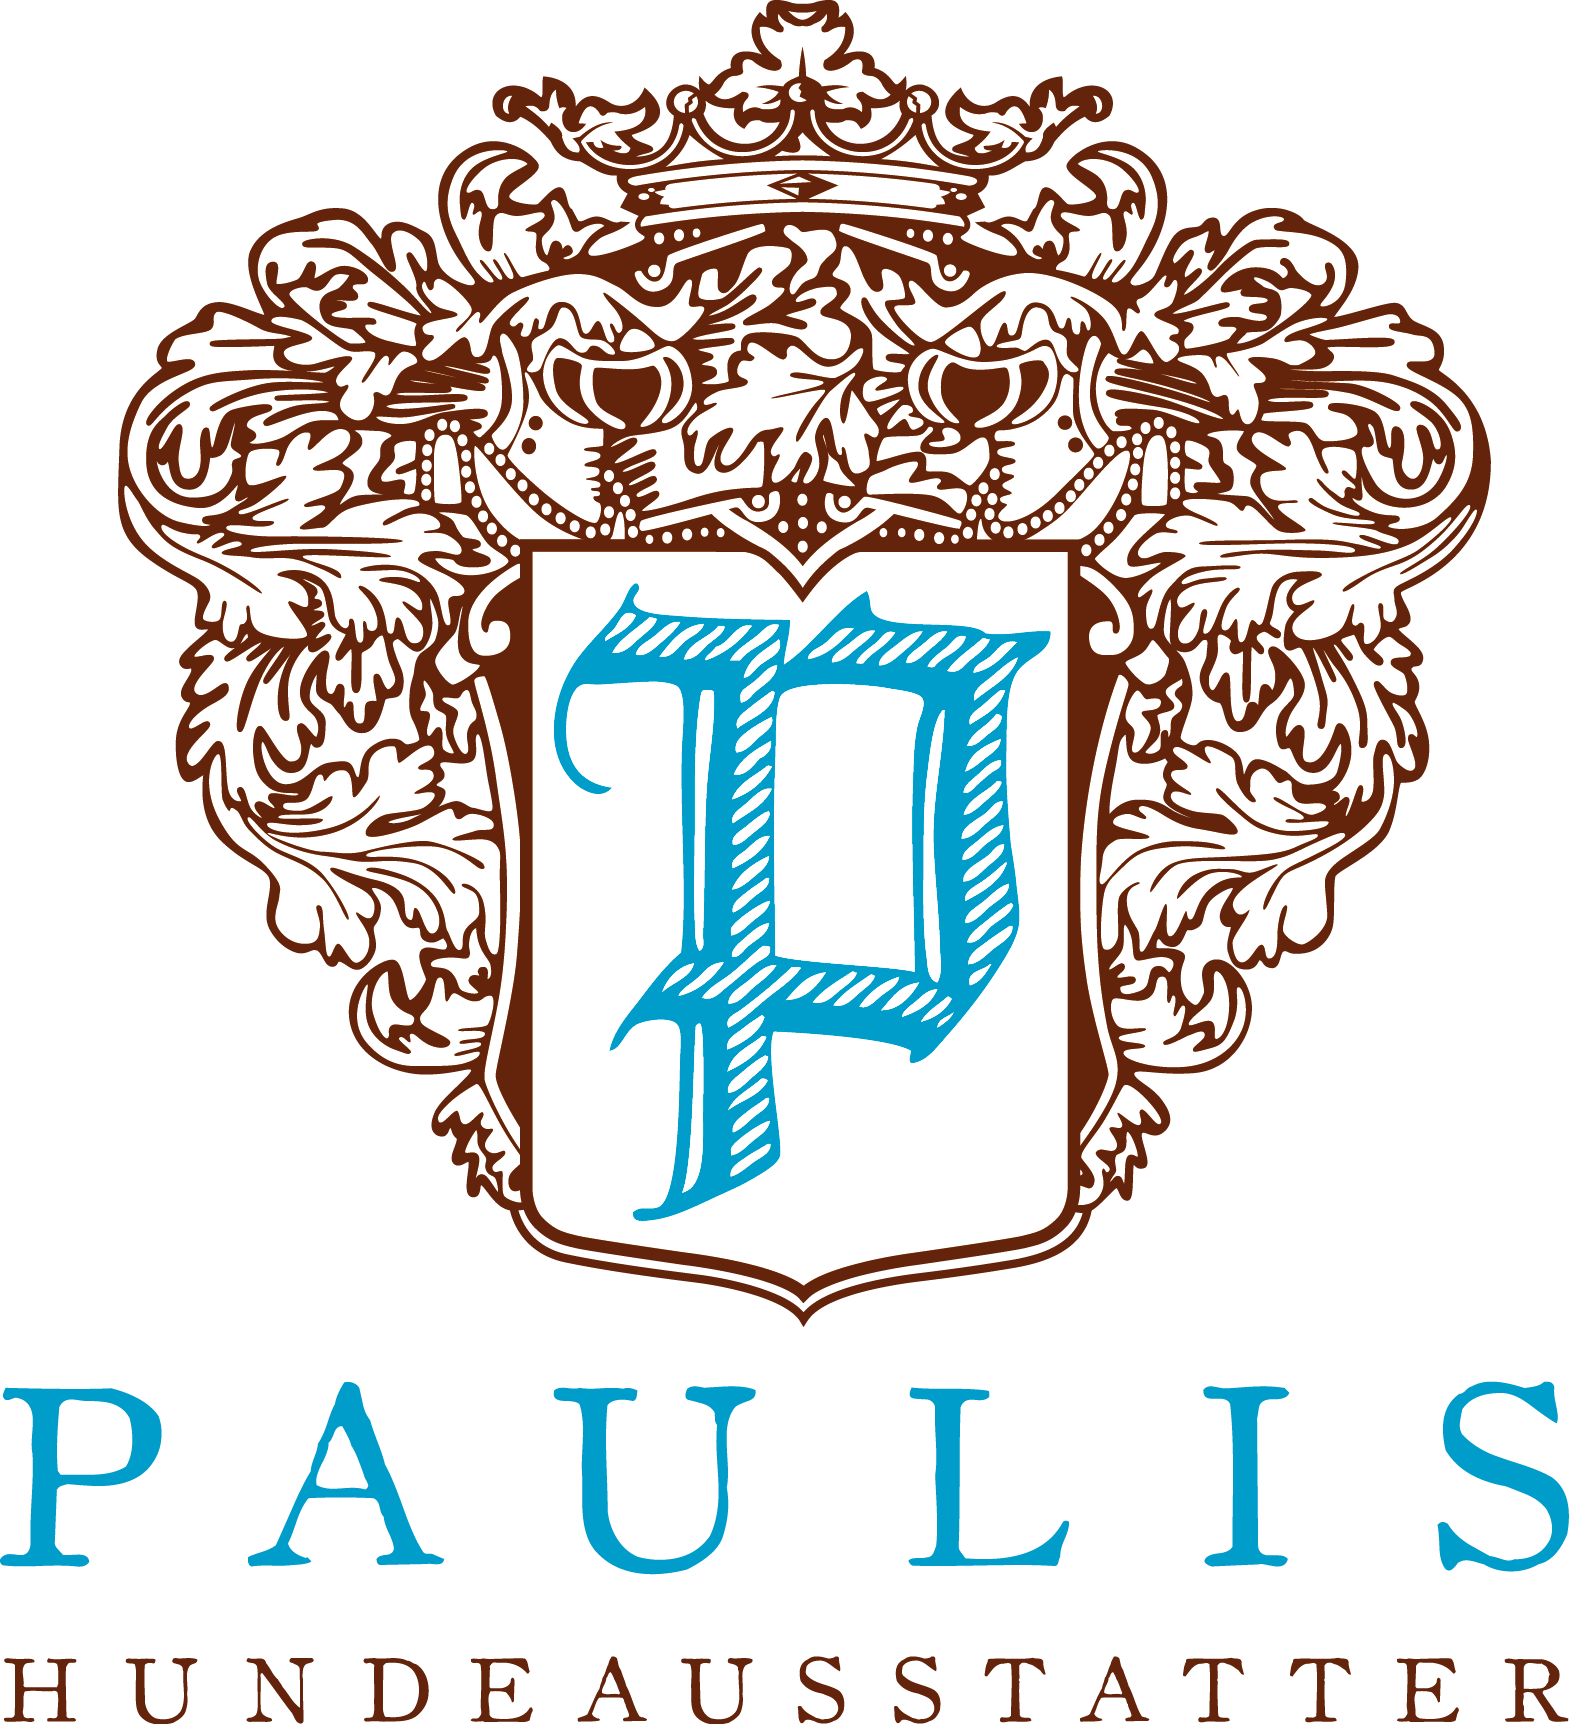 Paulis Hundeaustatter,  Gymnasiumstraße 64, 1190 Wien